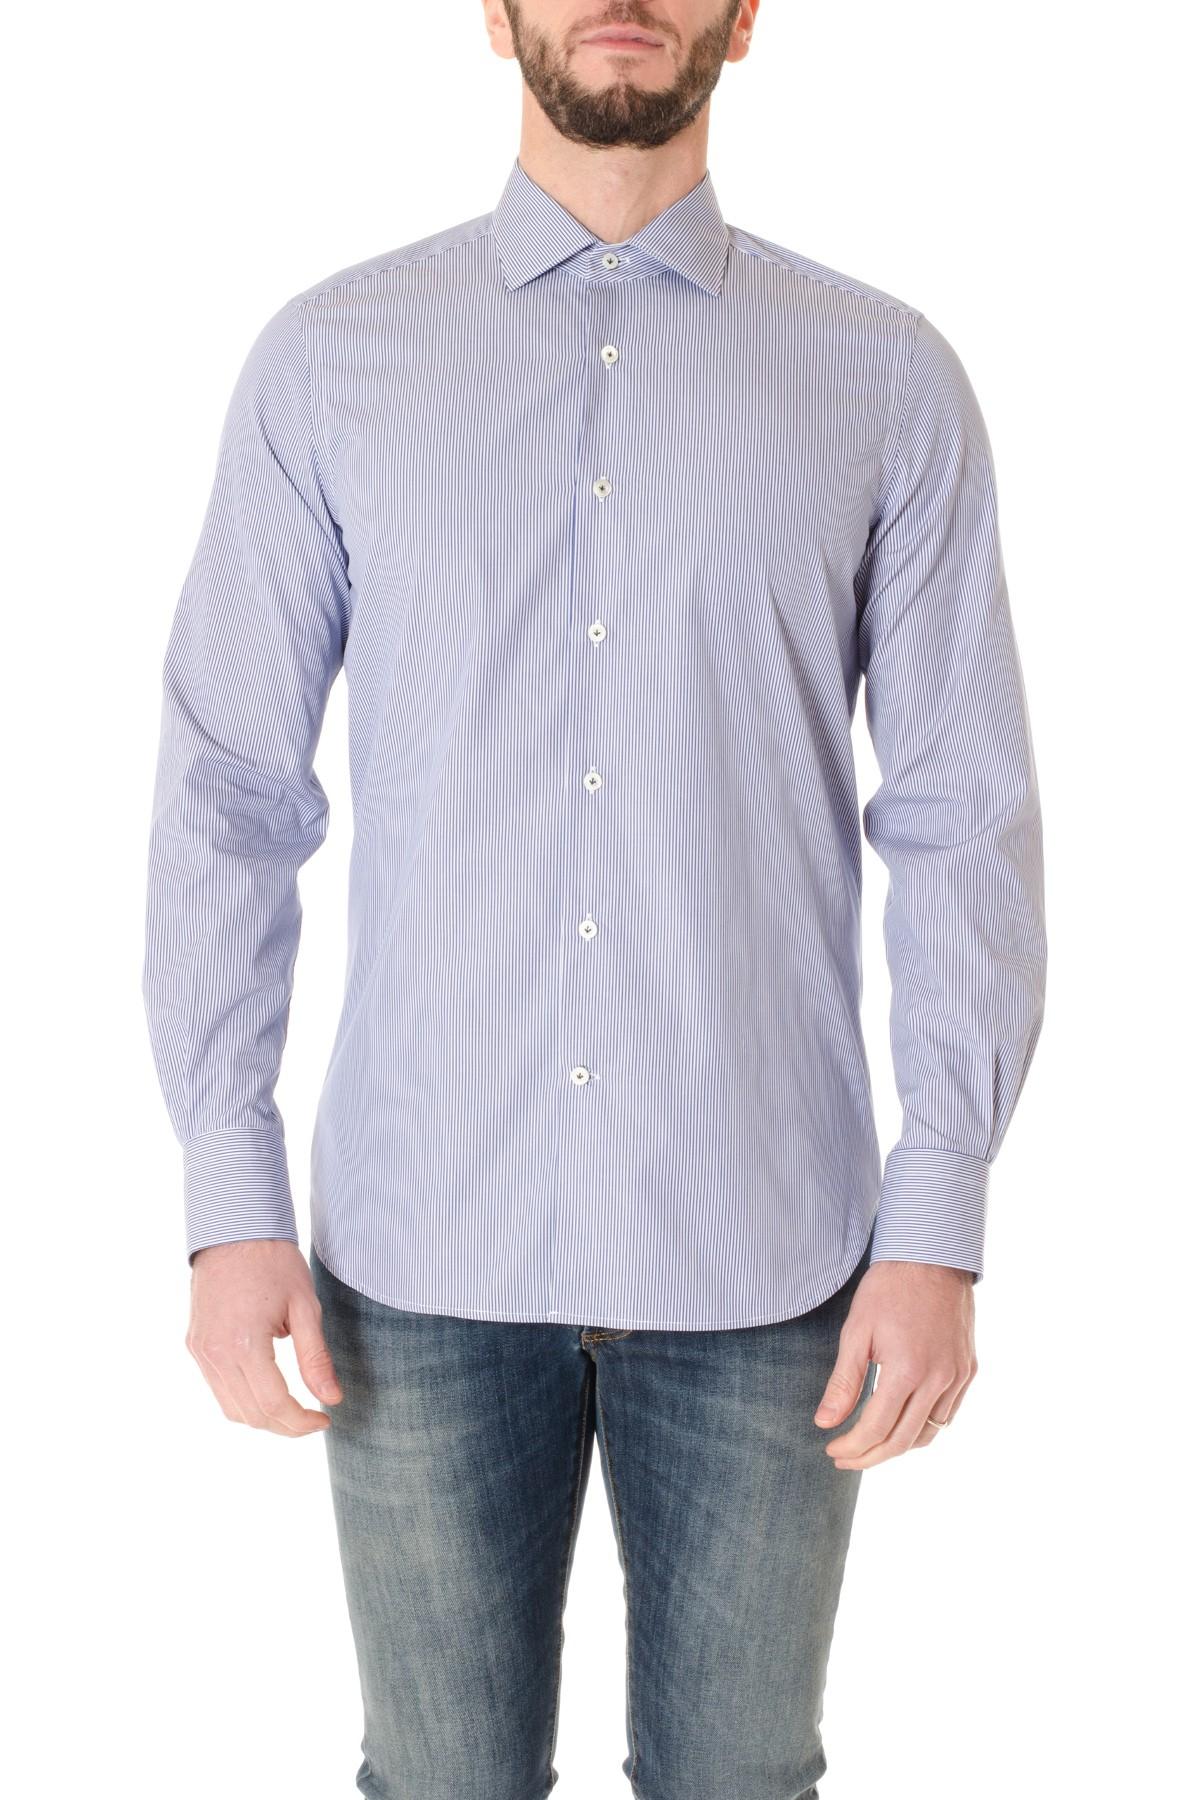 White shirt BORSA with blue stripes for men F/W 16-17 - Rione Fontana